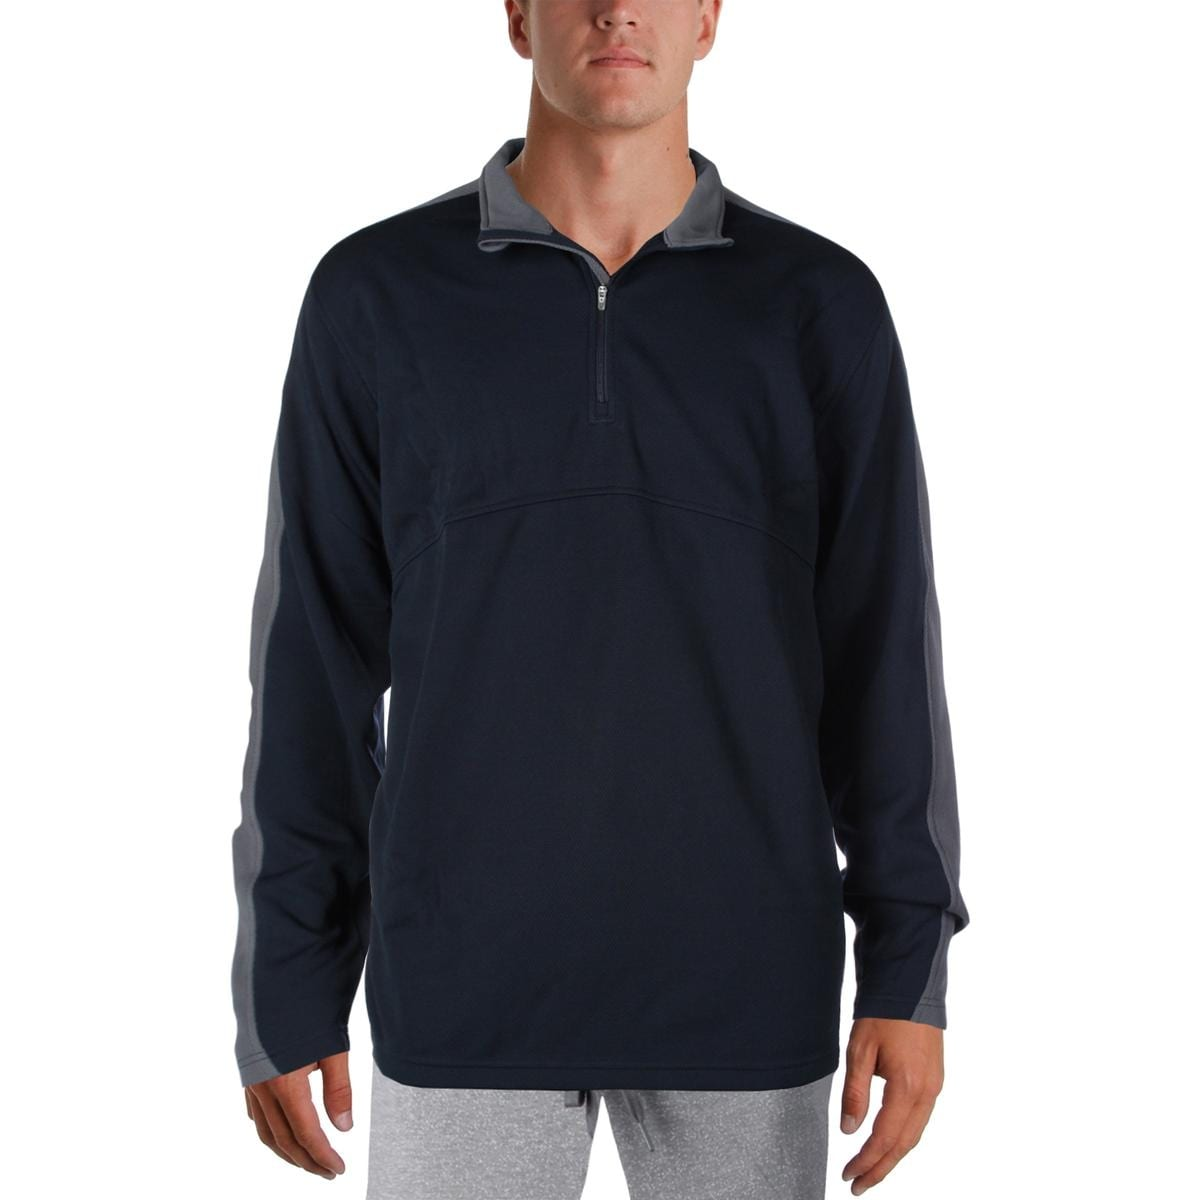 Charles River Apparel Mens 1/4 Zip Pullover Fitness Jacket - Thumbnail 2